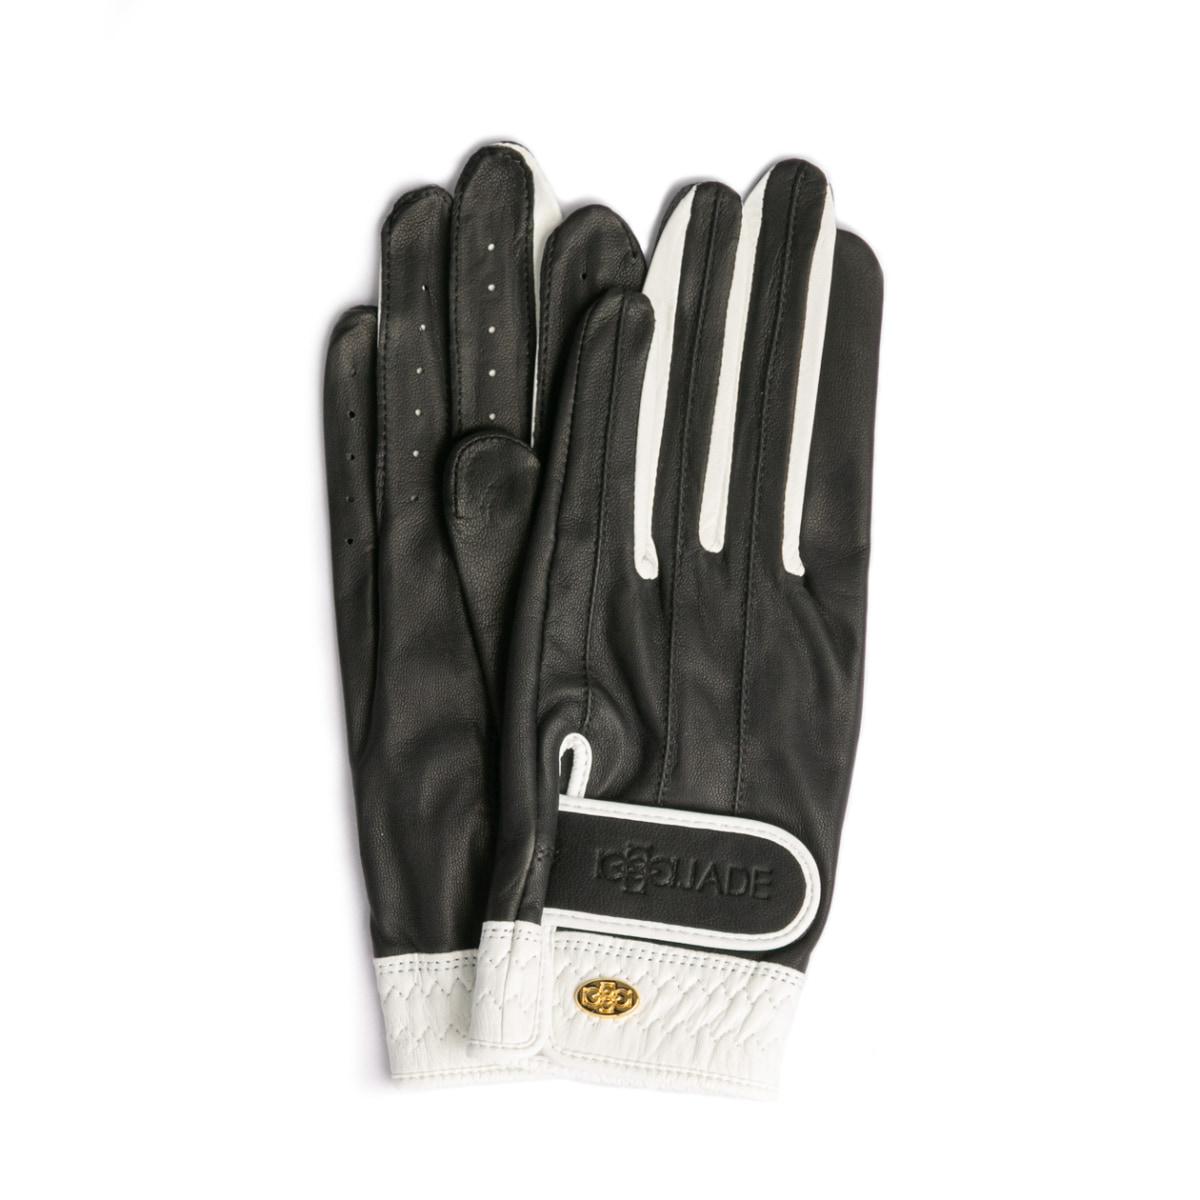 Elegant Golf Glove【両手】black-white